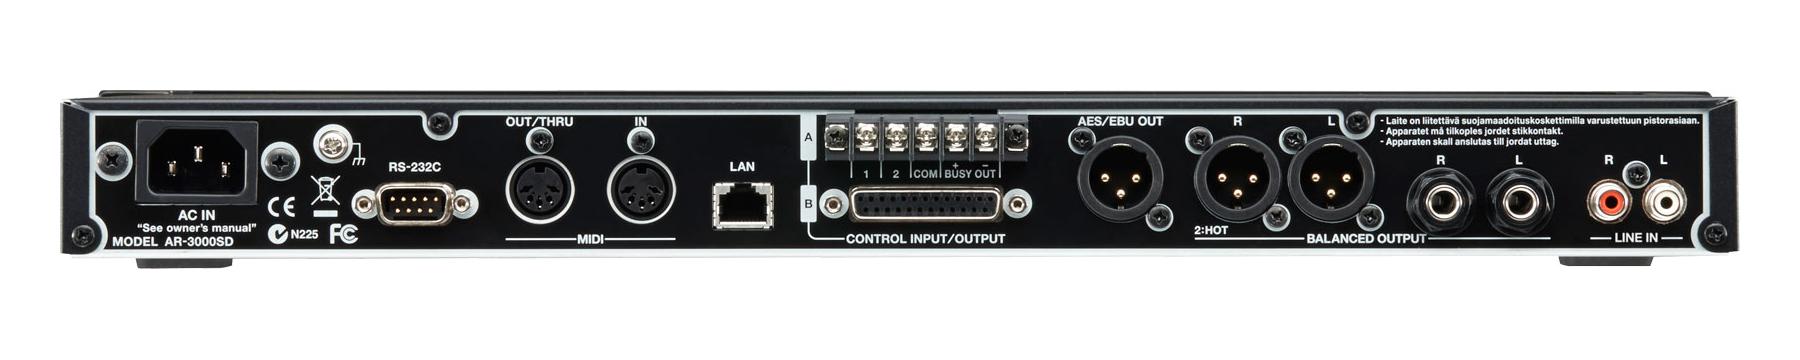 Roland AR-3000SD Rear Connectors